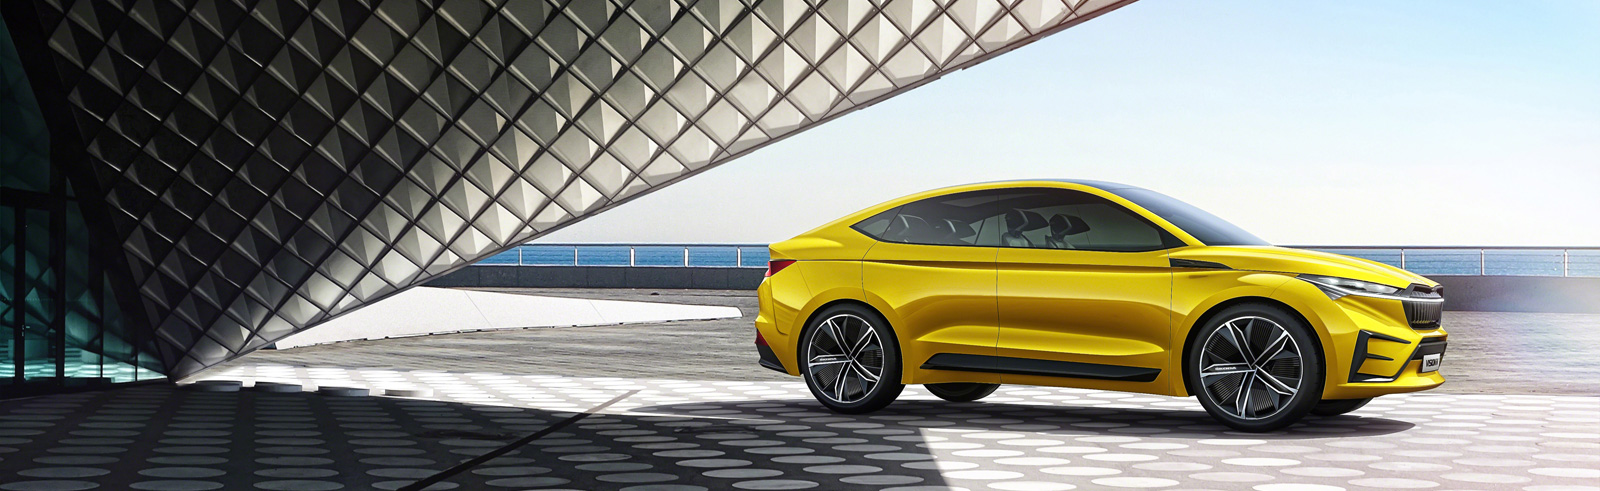 Škoda Vision iV is presented at the 2019 Geneva Motor Show